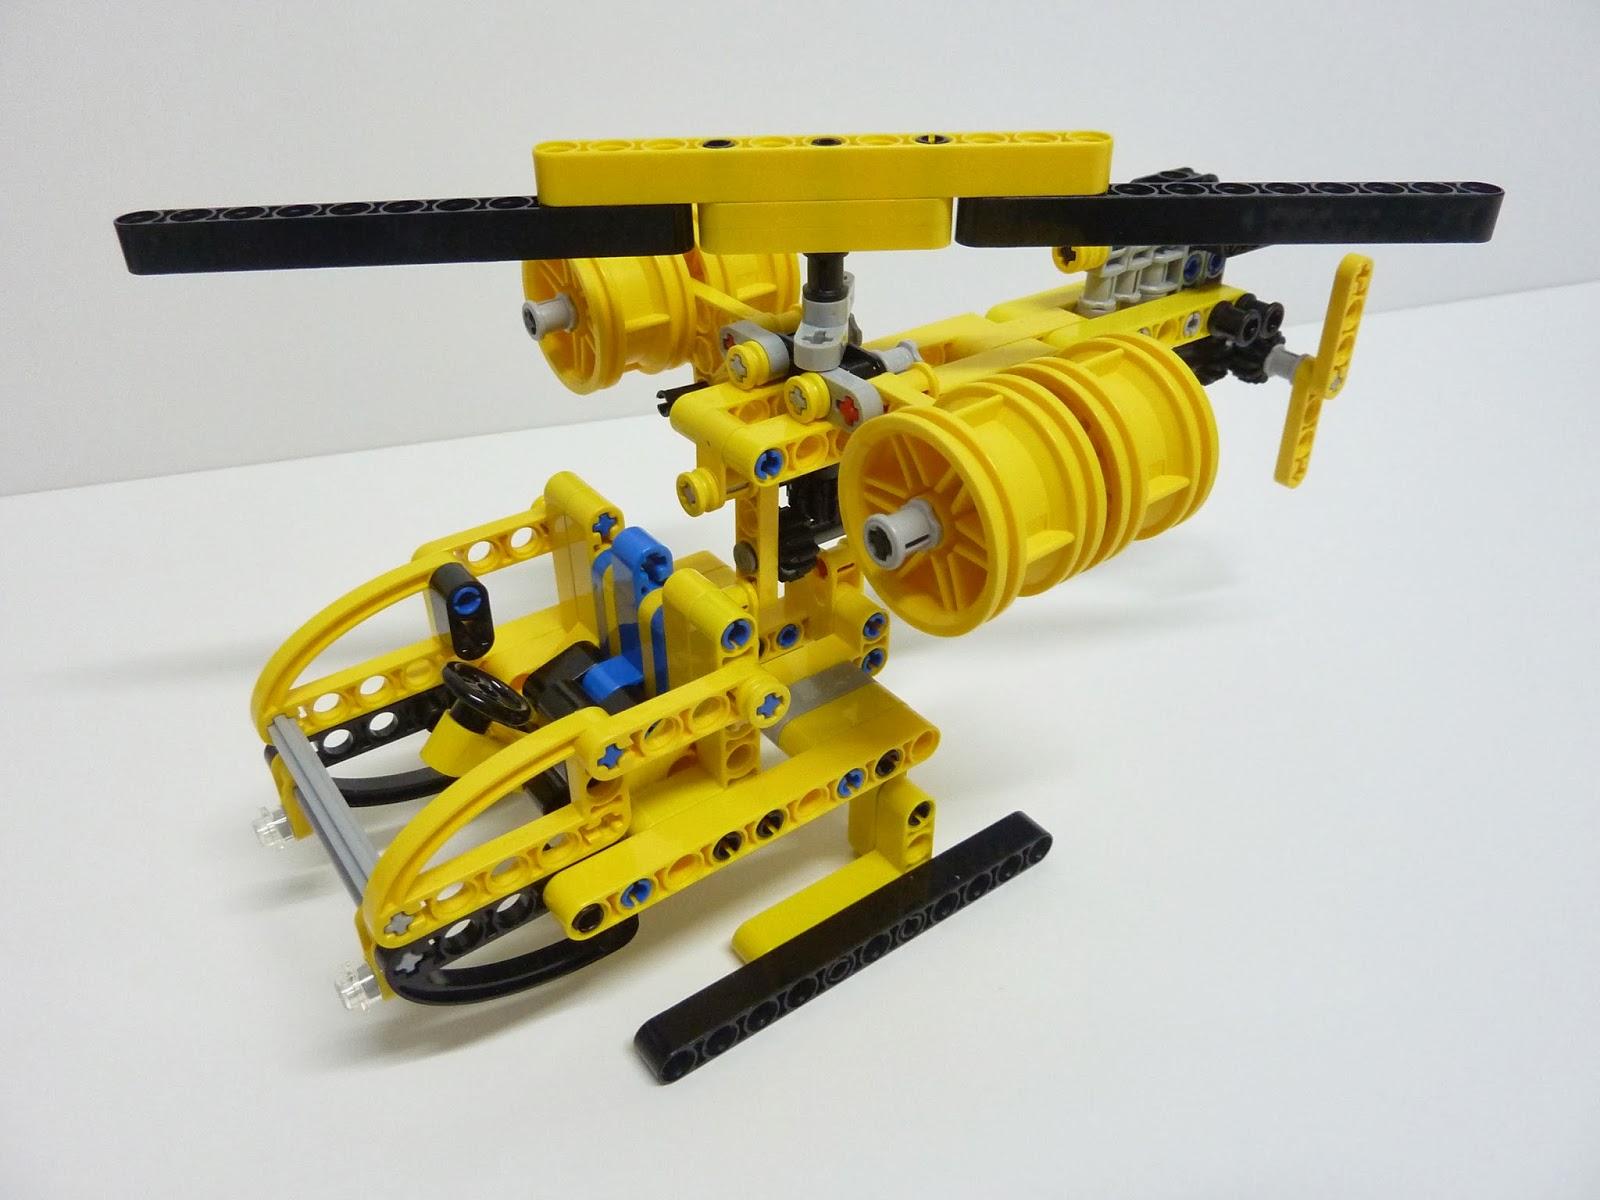 Brick Wink: REVIEW - Alternate Build: MOC 42004 - 001